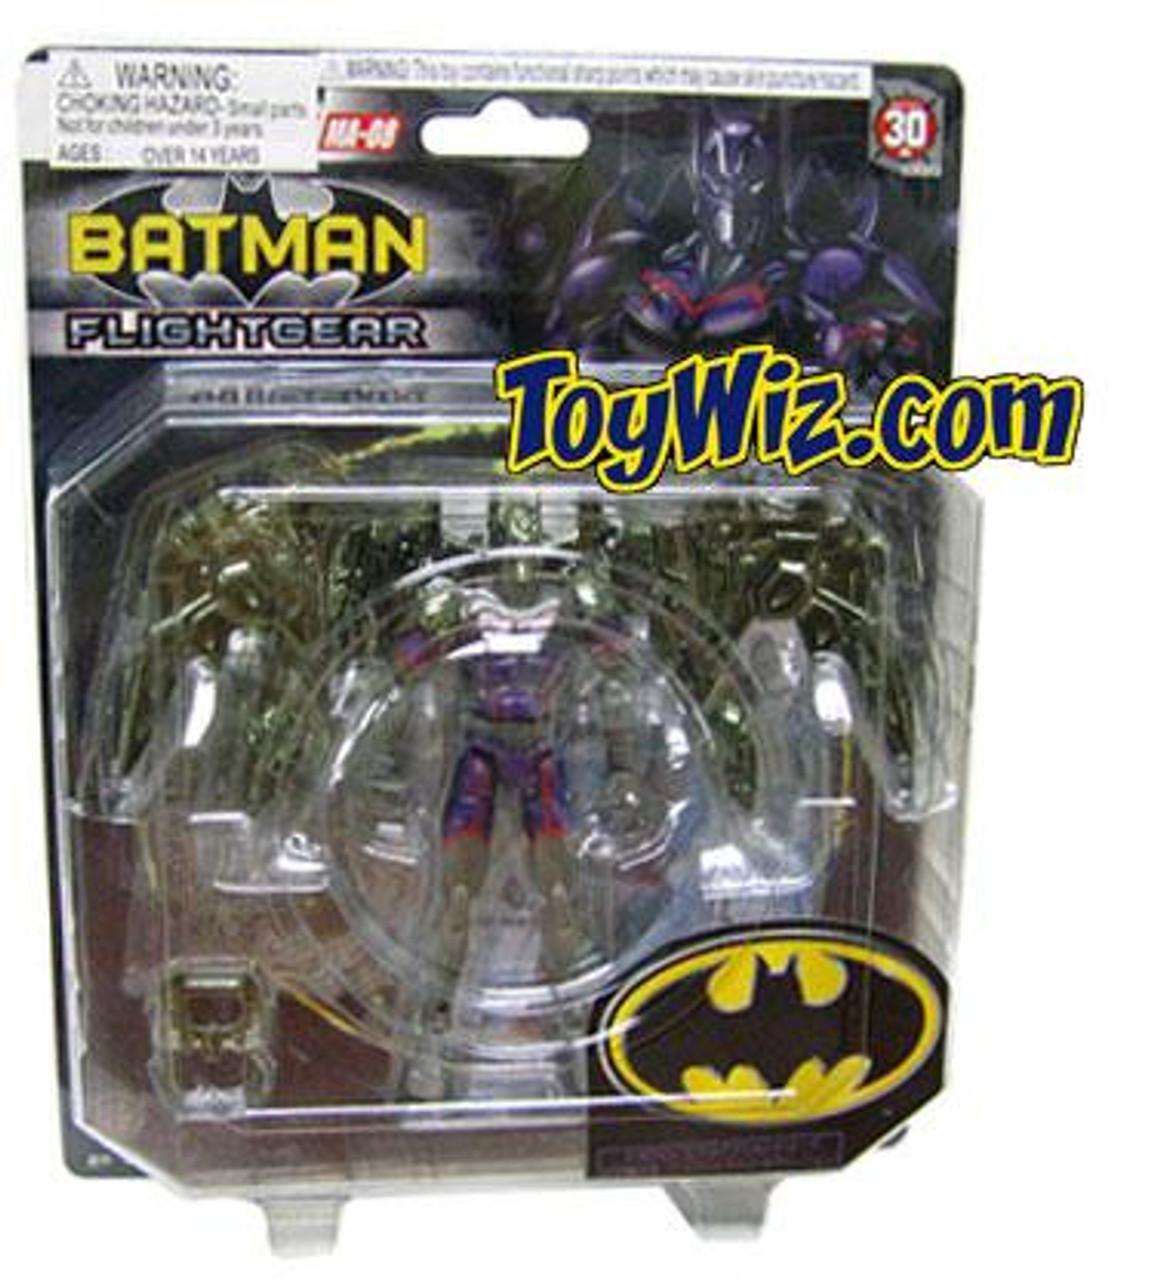 Micro Action Series Batman Mini Figure MA-08 [Flightgear]